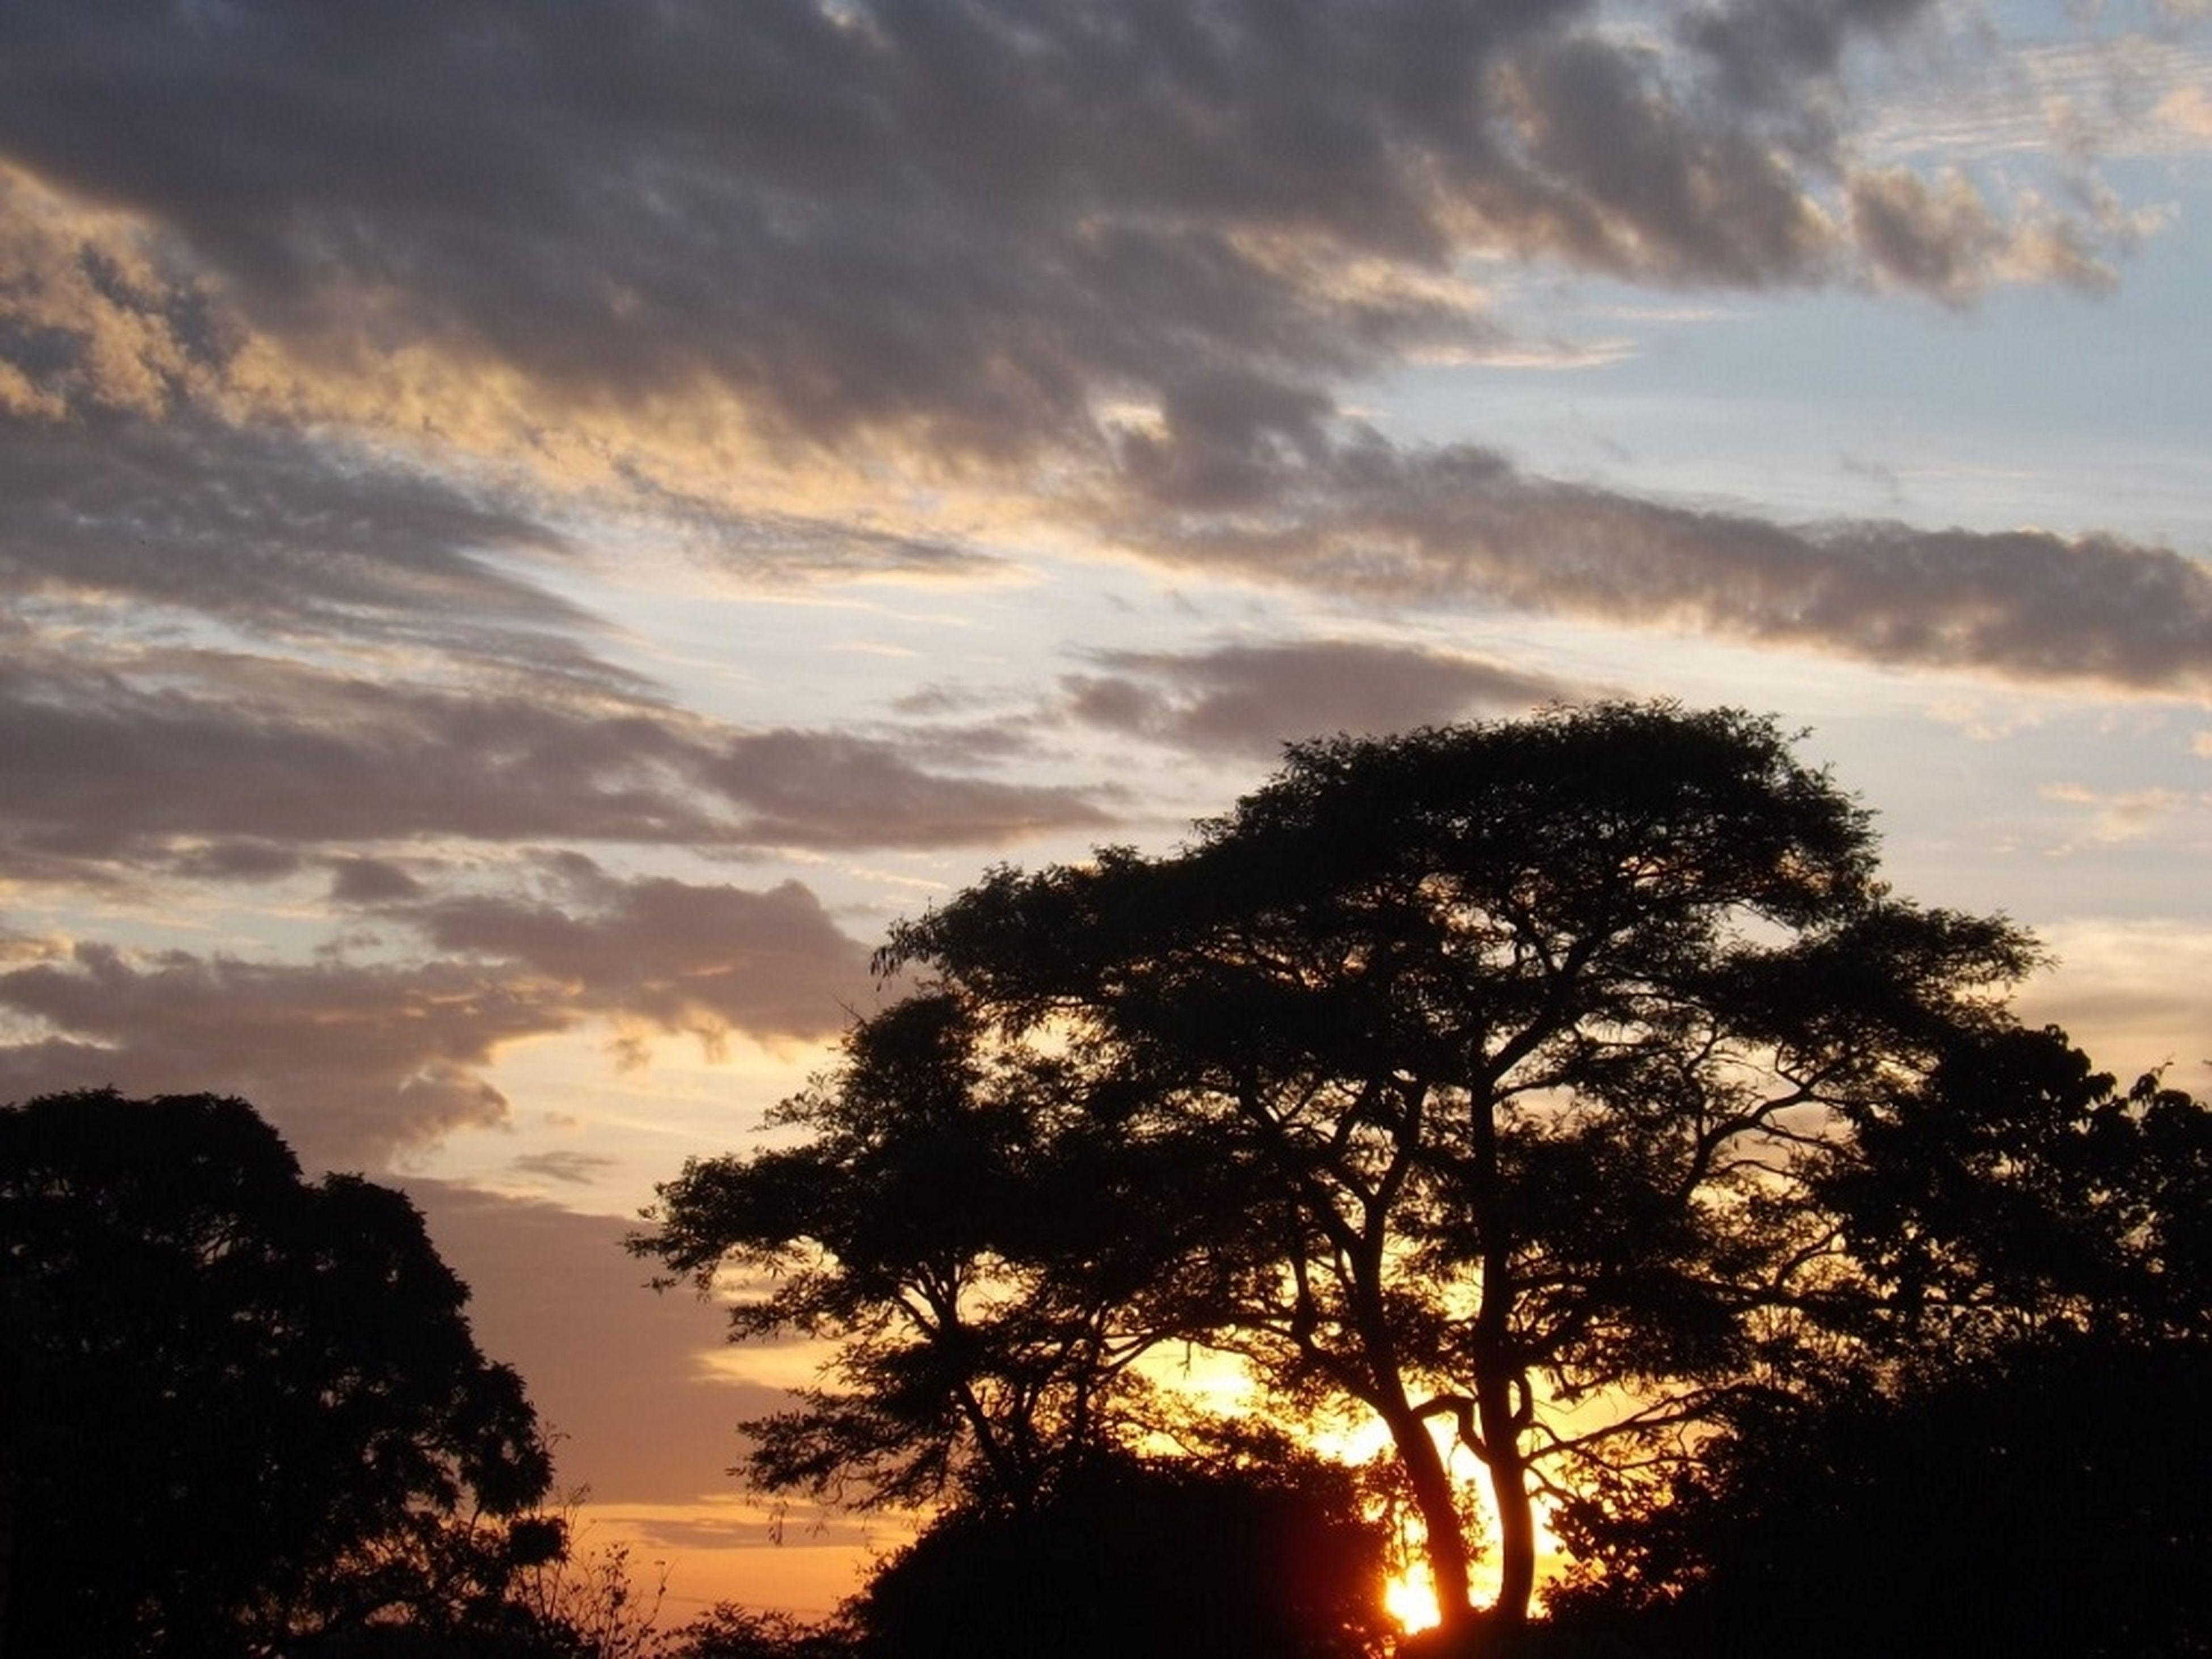 sunset, silhouette, tree, sun, sky, tranquil scene, scenics, tranquility, beauty in nature, orange color, nature, cloud - sky, idyllic, sunlight, back lit, cloud, dramatic sky, sunbeam, low angle view, majestic